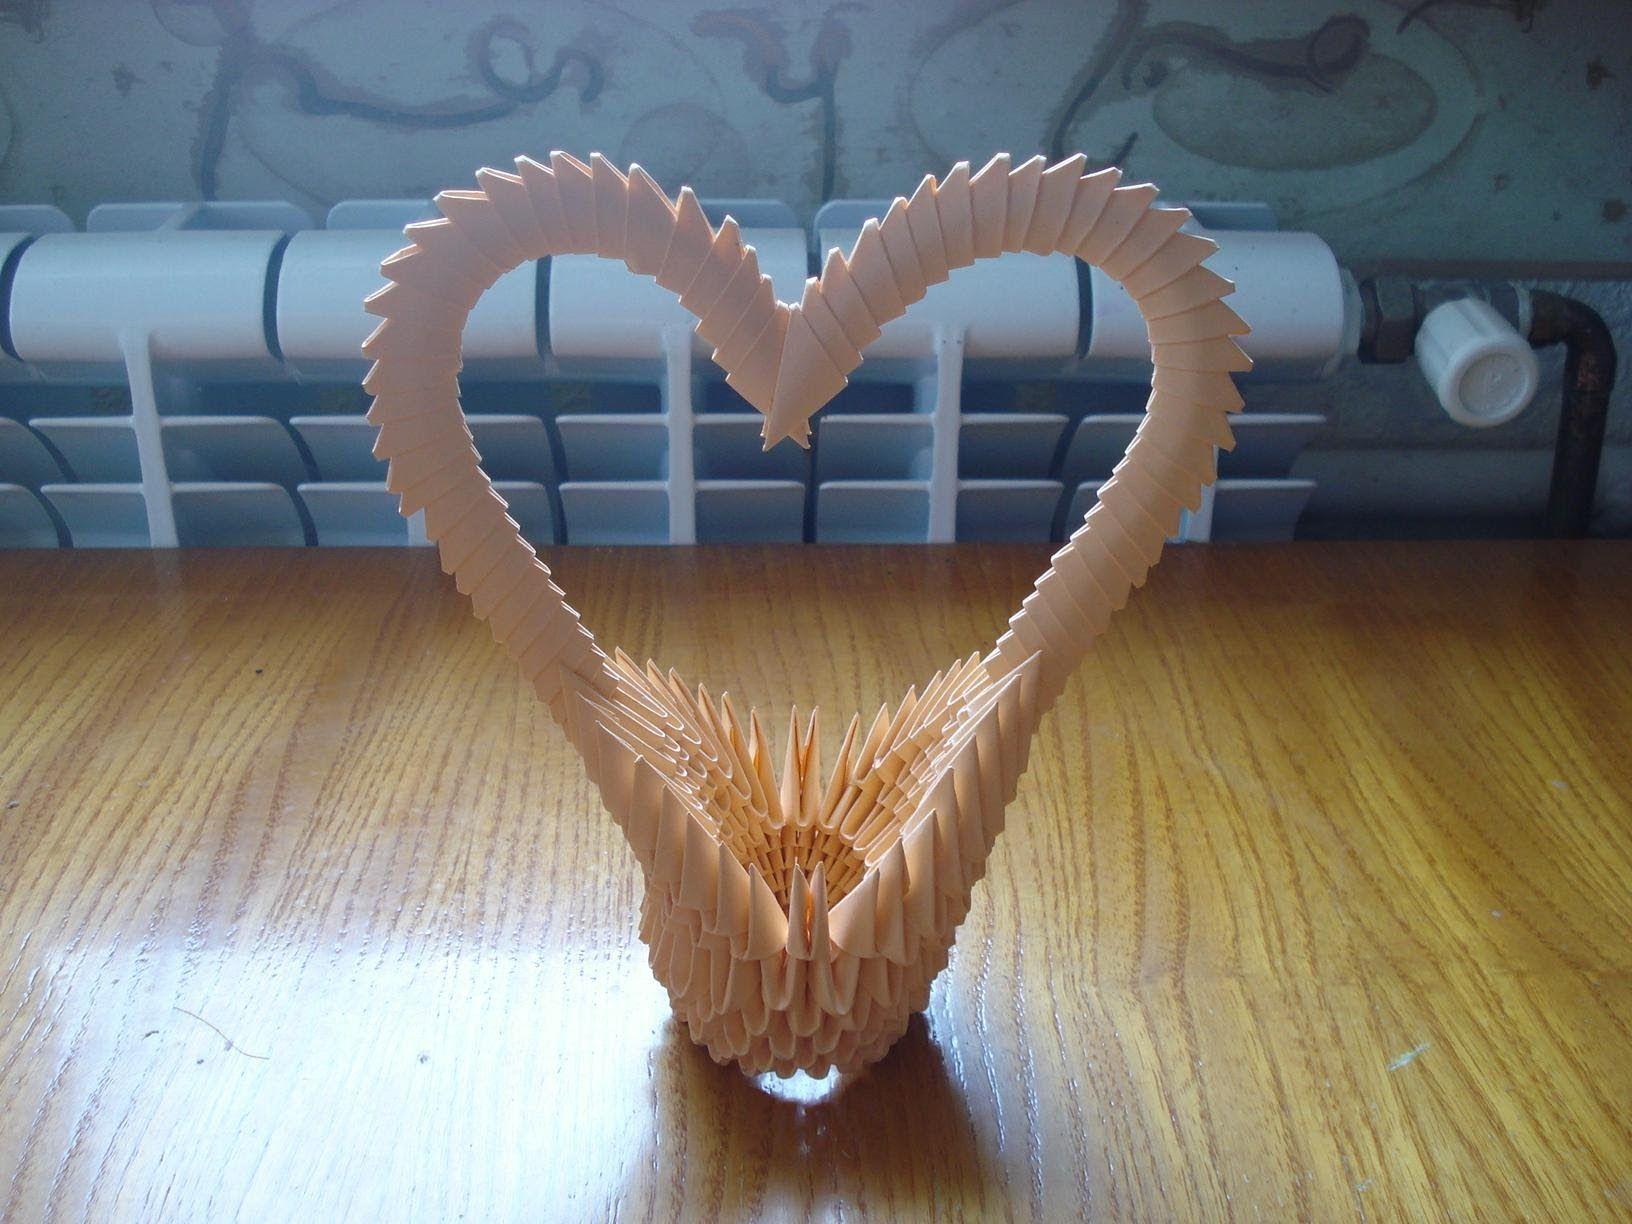 3D Origami Heart Basket Tutorial | 3D Origami | Pinterest ... - photo#28